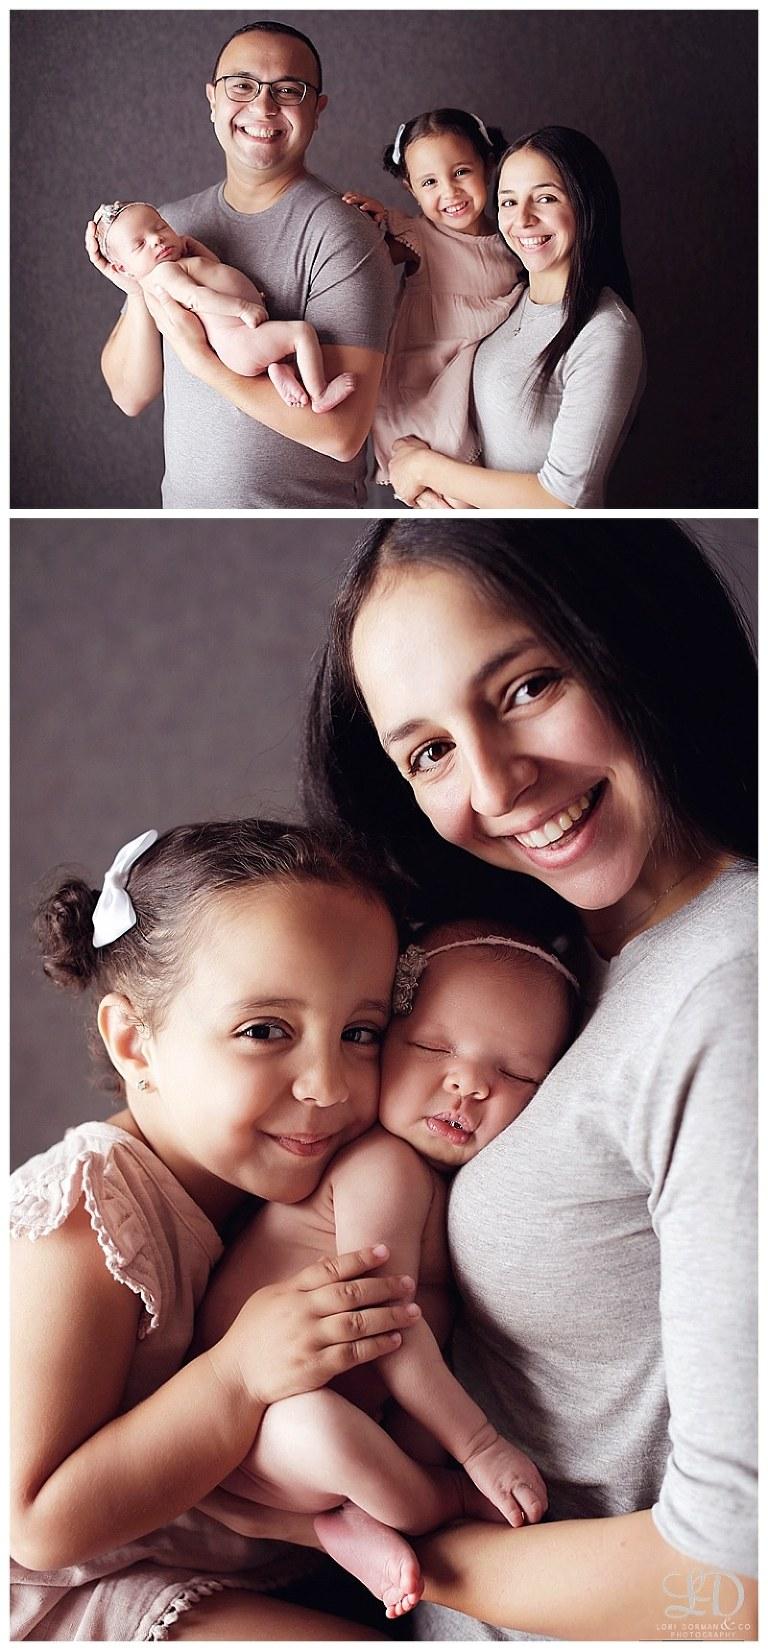 sweet maternity photoshoot-lori dorman photography-maternity boudoir-professional photographer_2284.jpg